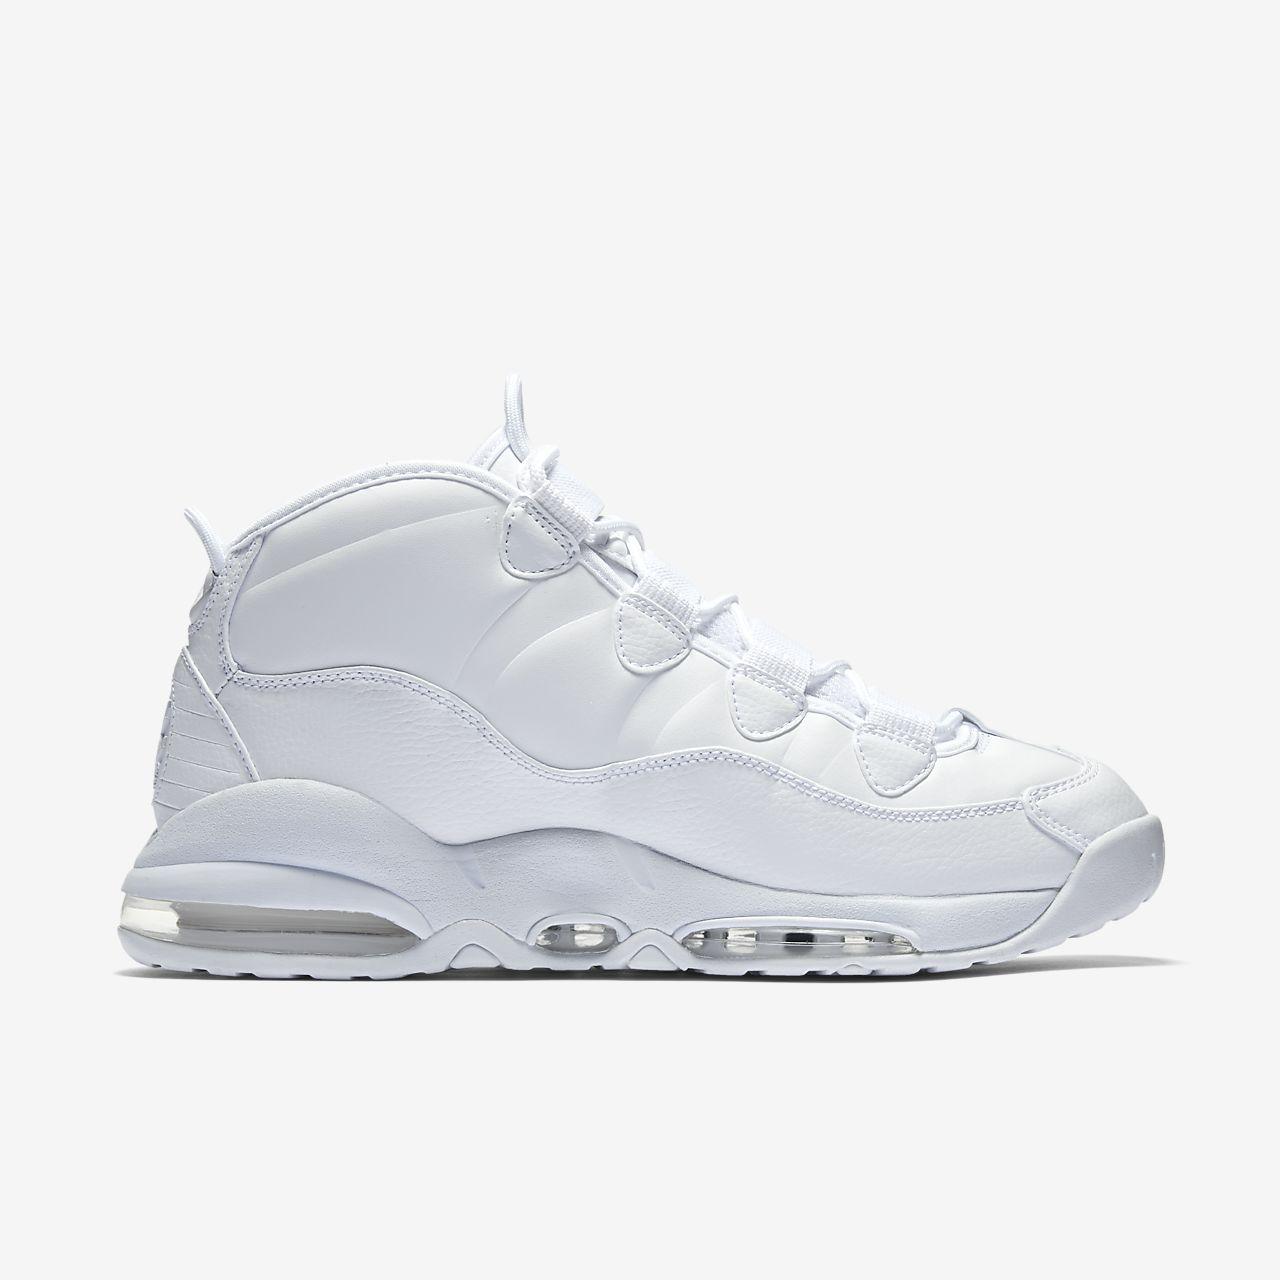 ... Nike Air Max Uptempo 95 Men's Shoe